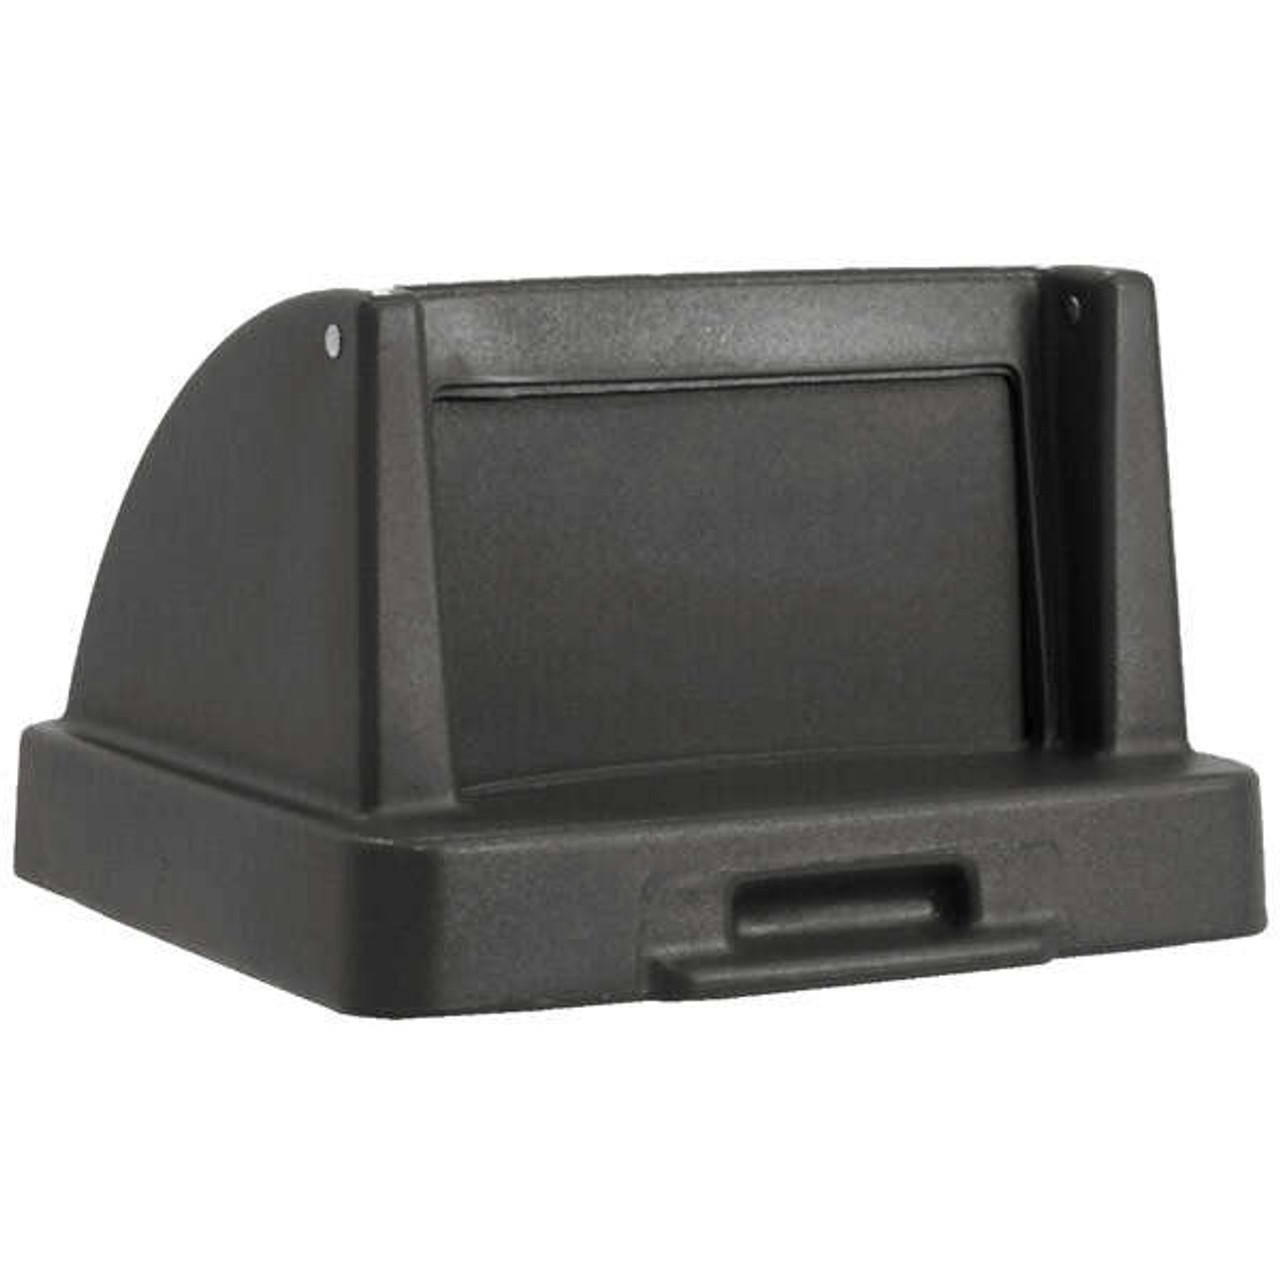 20.5 x 20.5 Push Door Plastic Lids TF1405QS for Square Trash Cans Charcoal